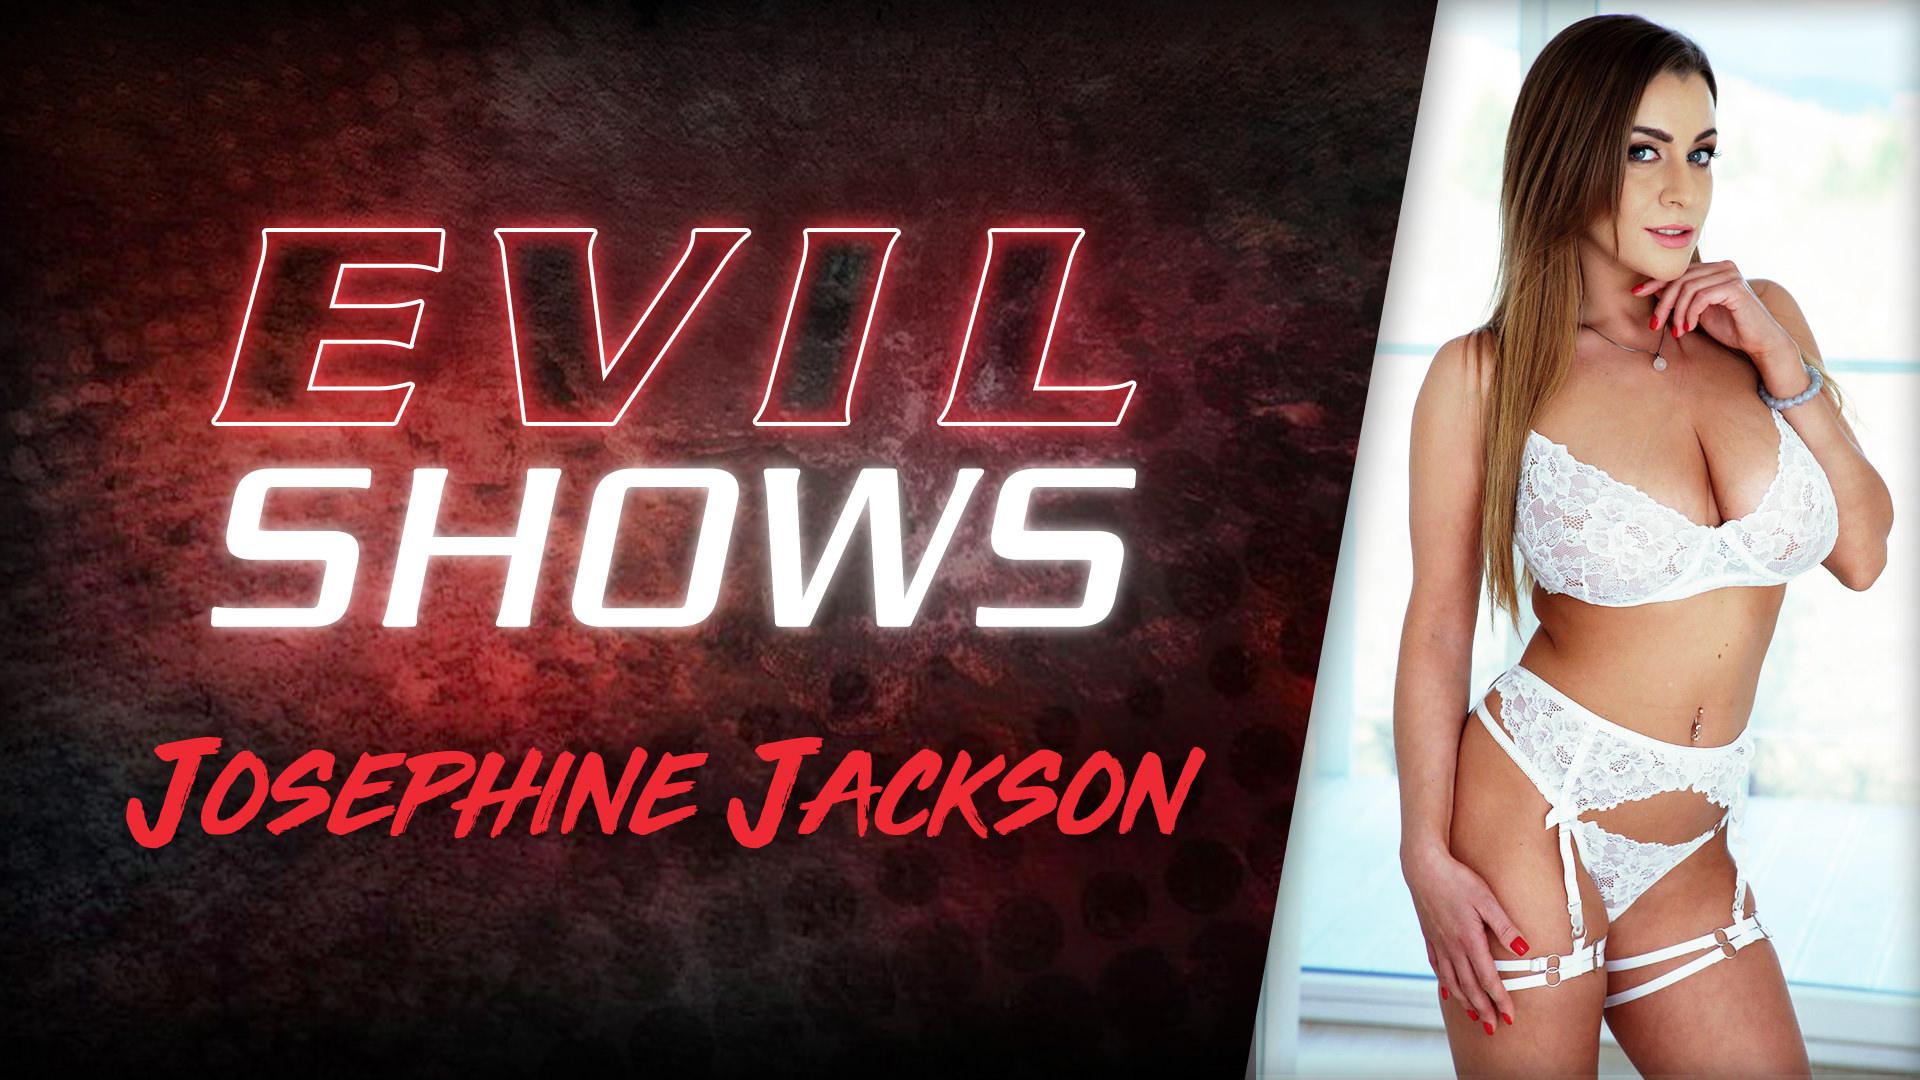 Evil Shows - Josephine Jackson